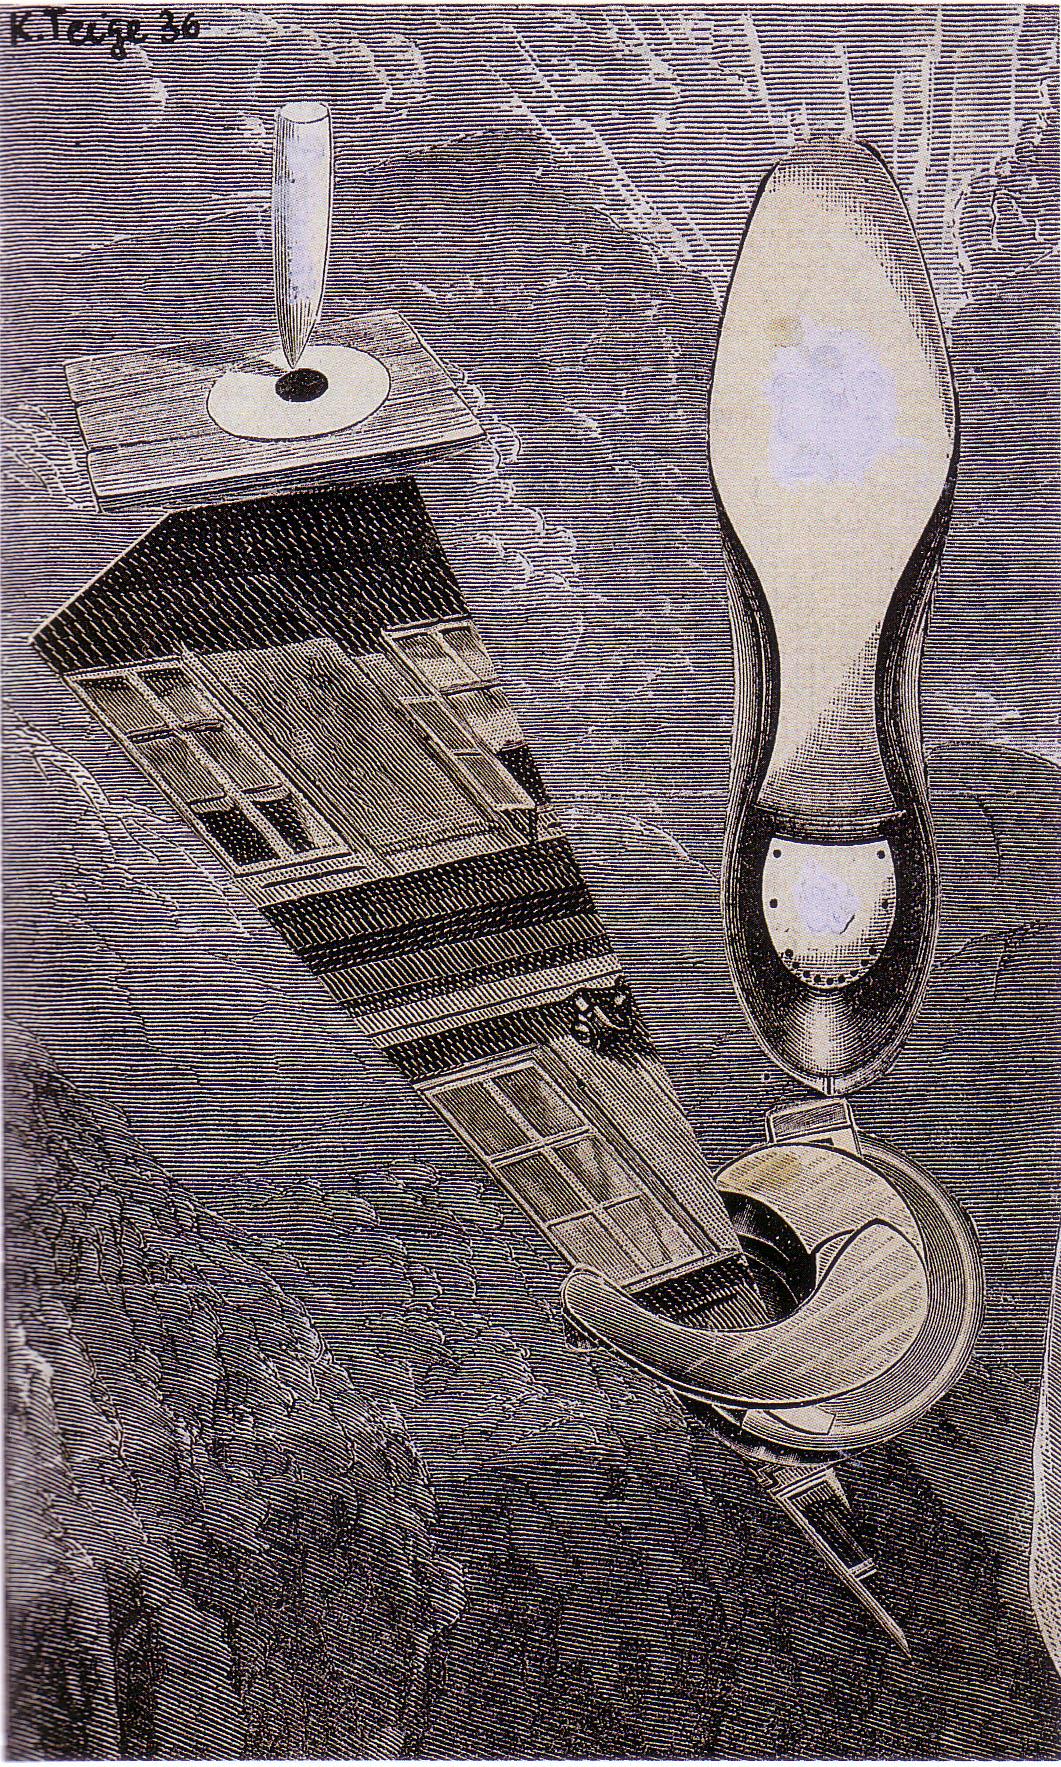 Karel Teige - Collage# 06, 1936 (c) Nachlass Karel Teige